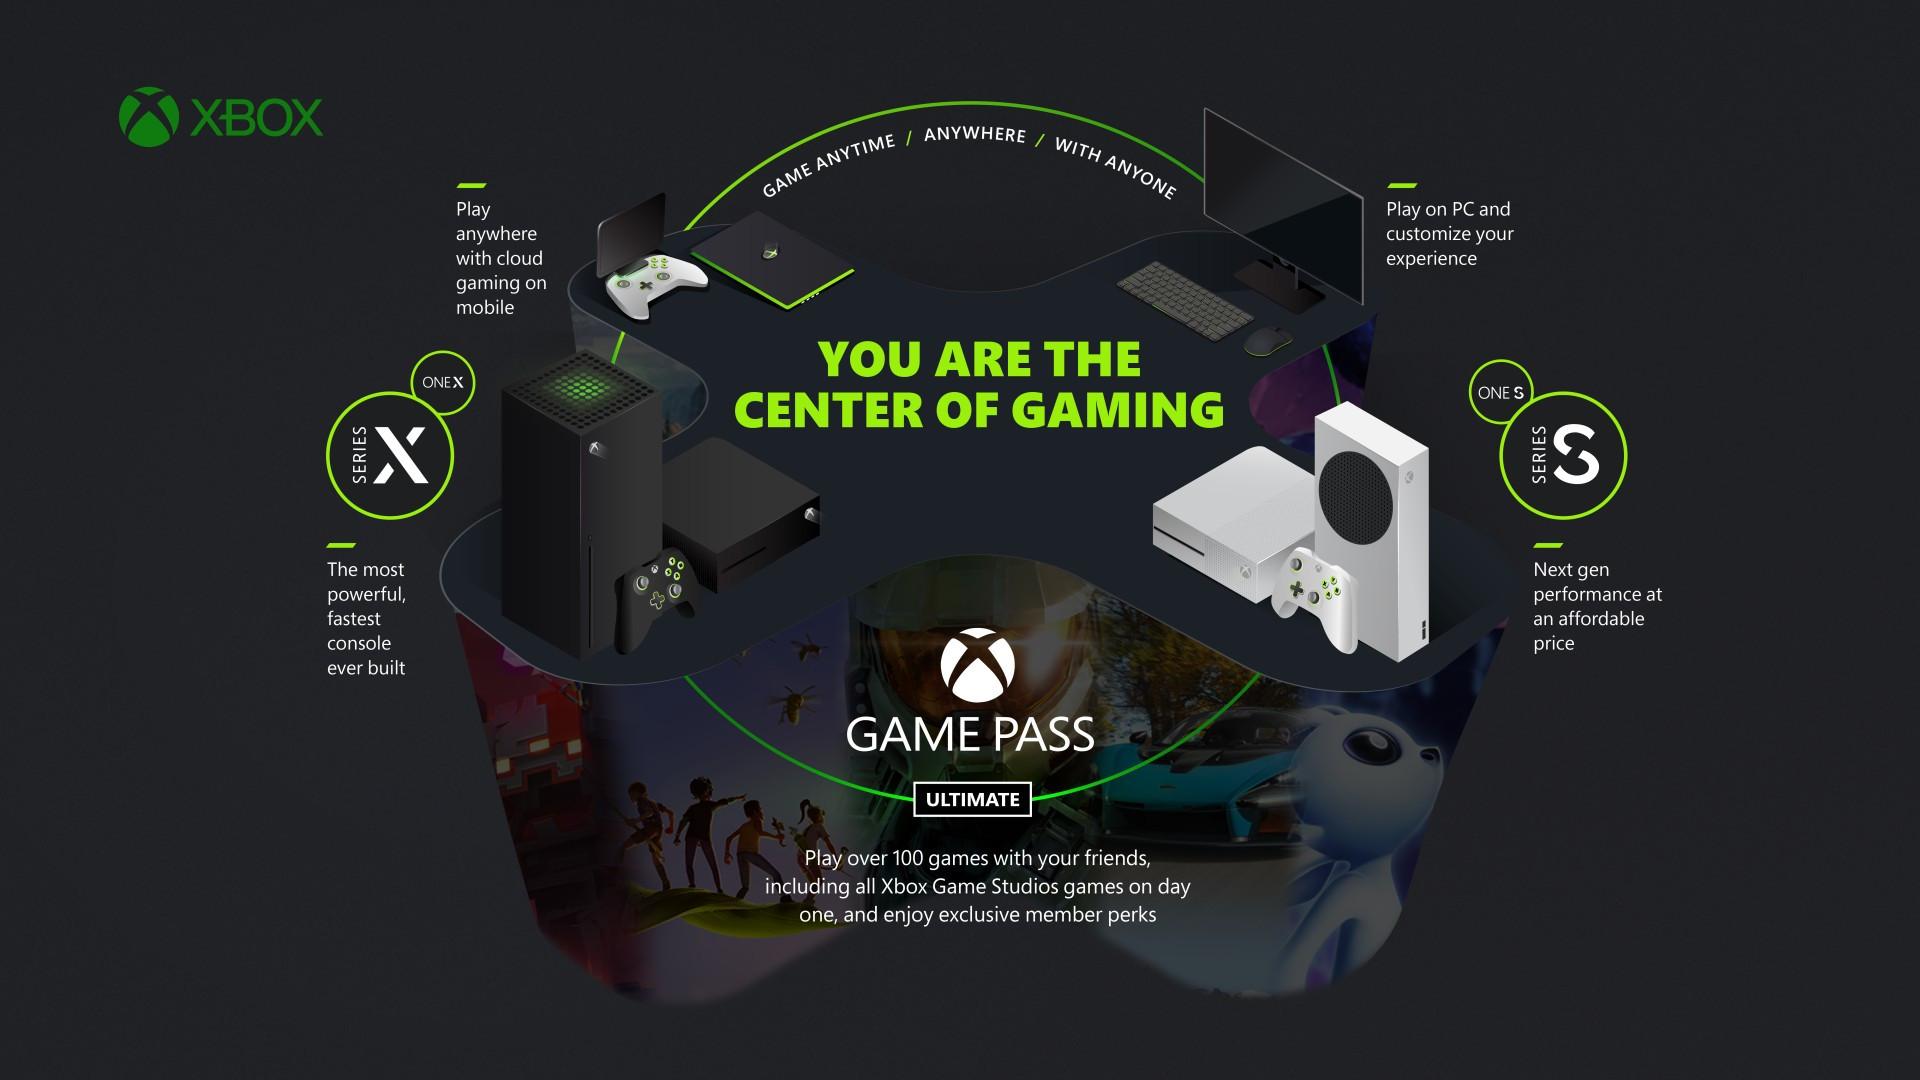 https://www.numerama.com/content/uploads/2020/09/xboxeco_playeratthecenter_9-28_1920x1080_jpg.jpg